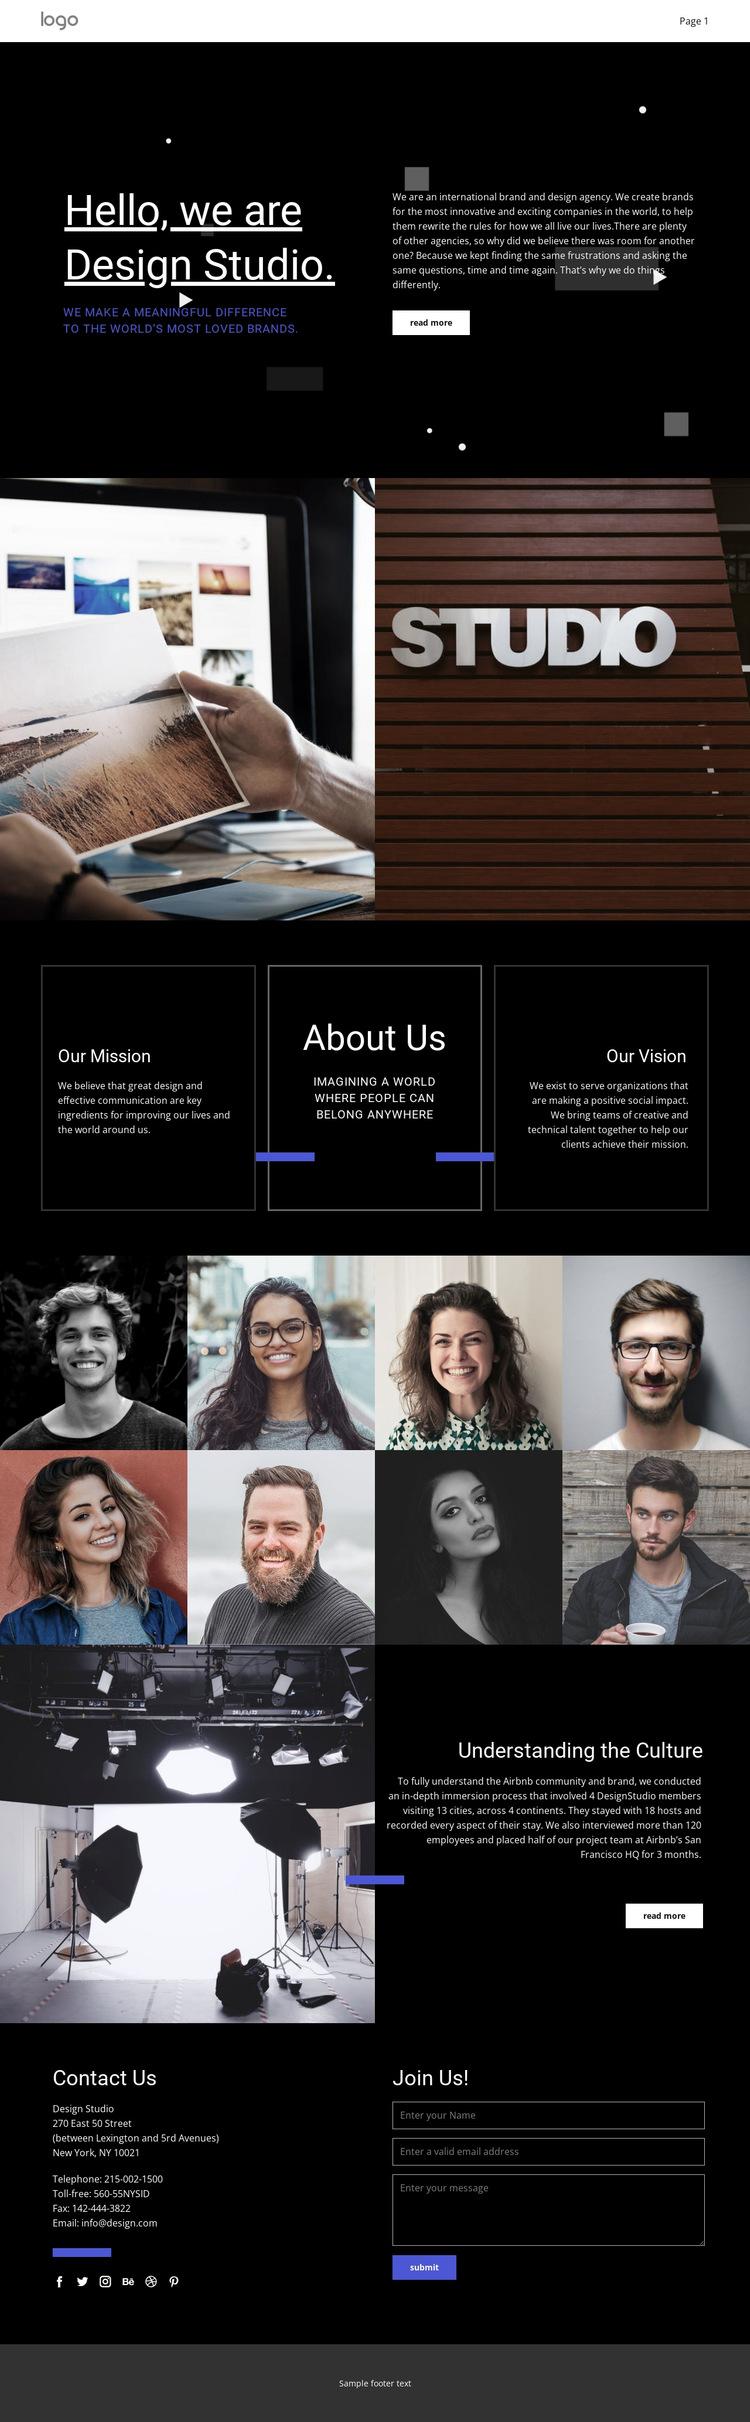 Our design is unique HTML5 Template